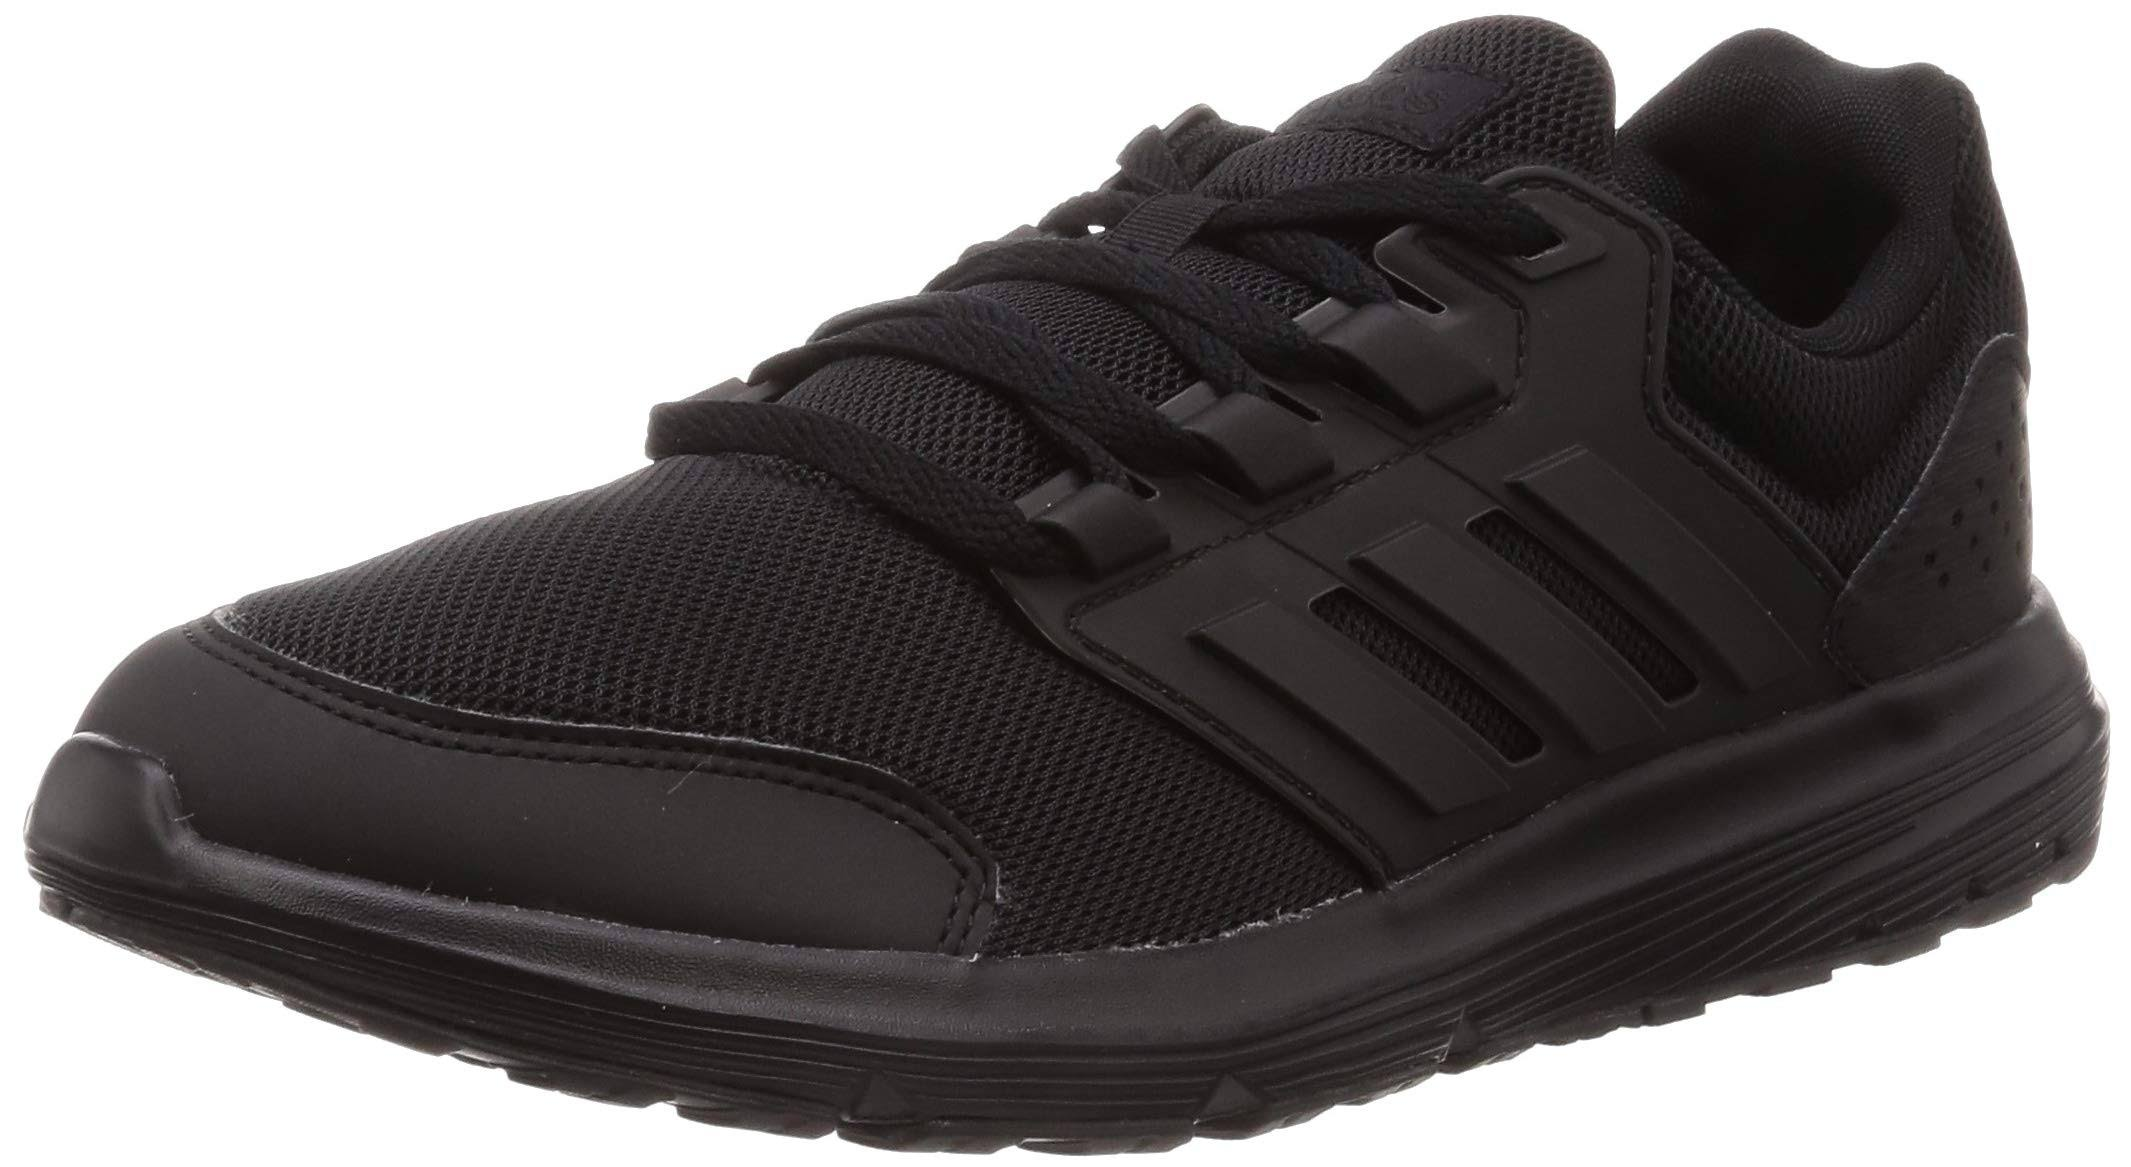 Adidas Galaxy 4 Black 10 - Men's Running Shoes